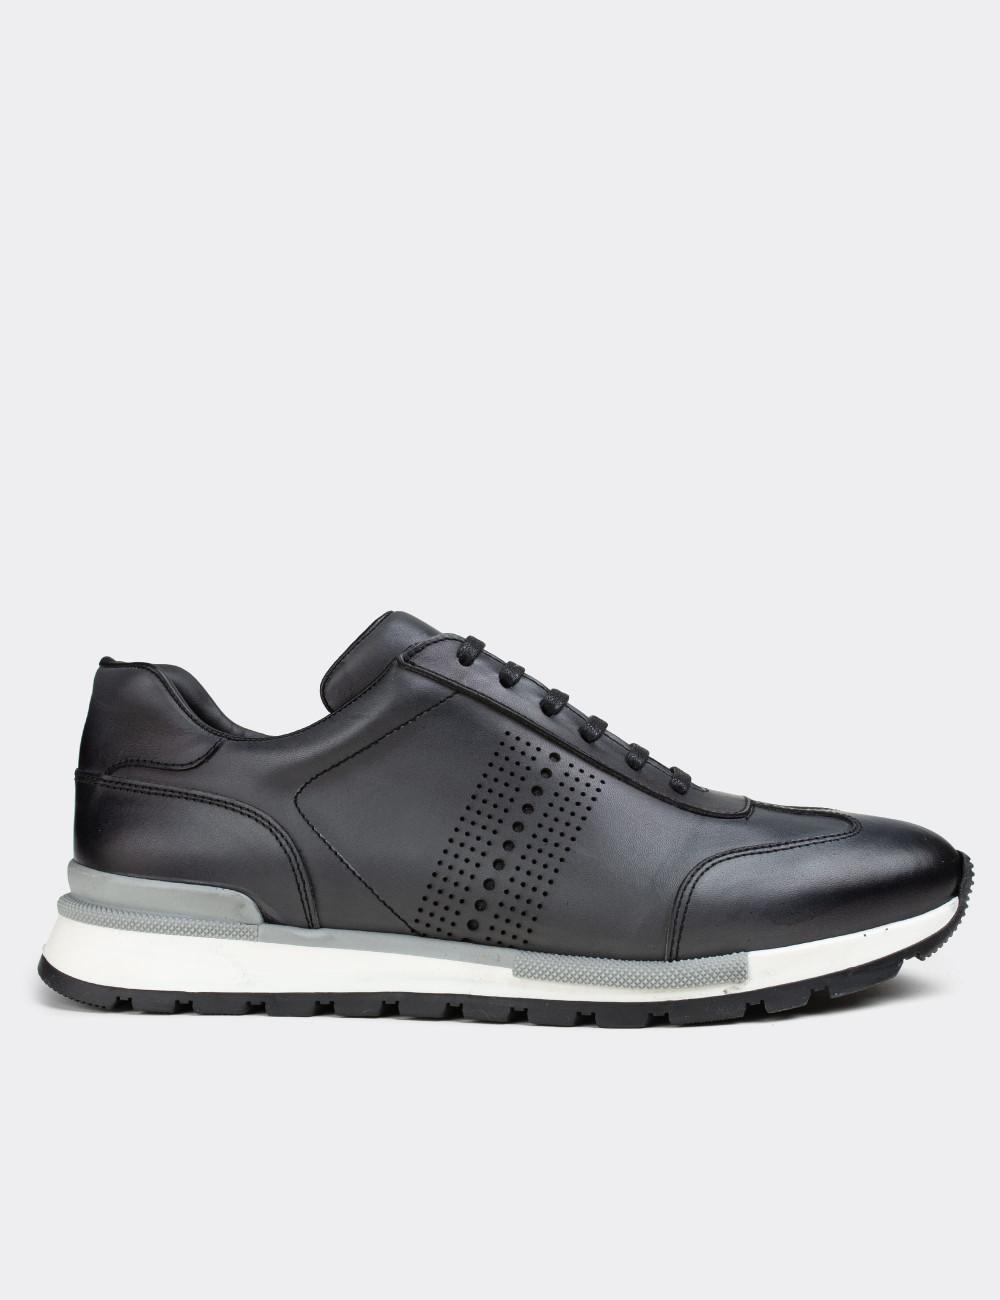 Hakiki Deri Gri Sneaker Erkek Ayakkabı - 01738MGRIT01